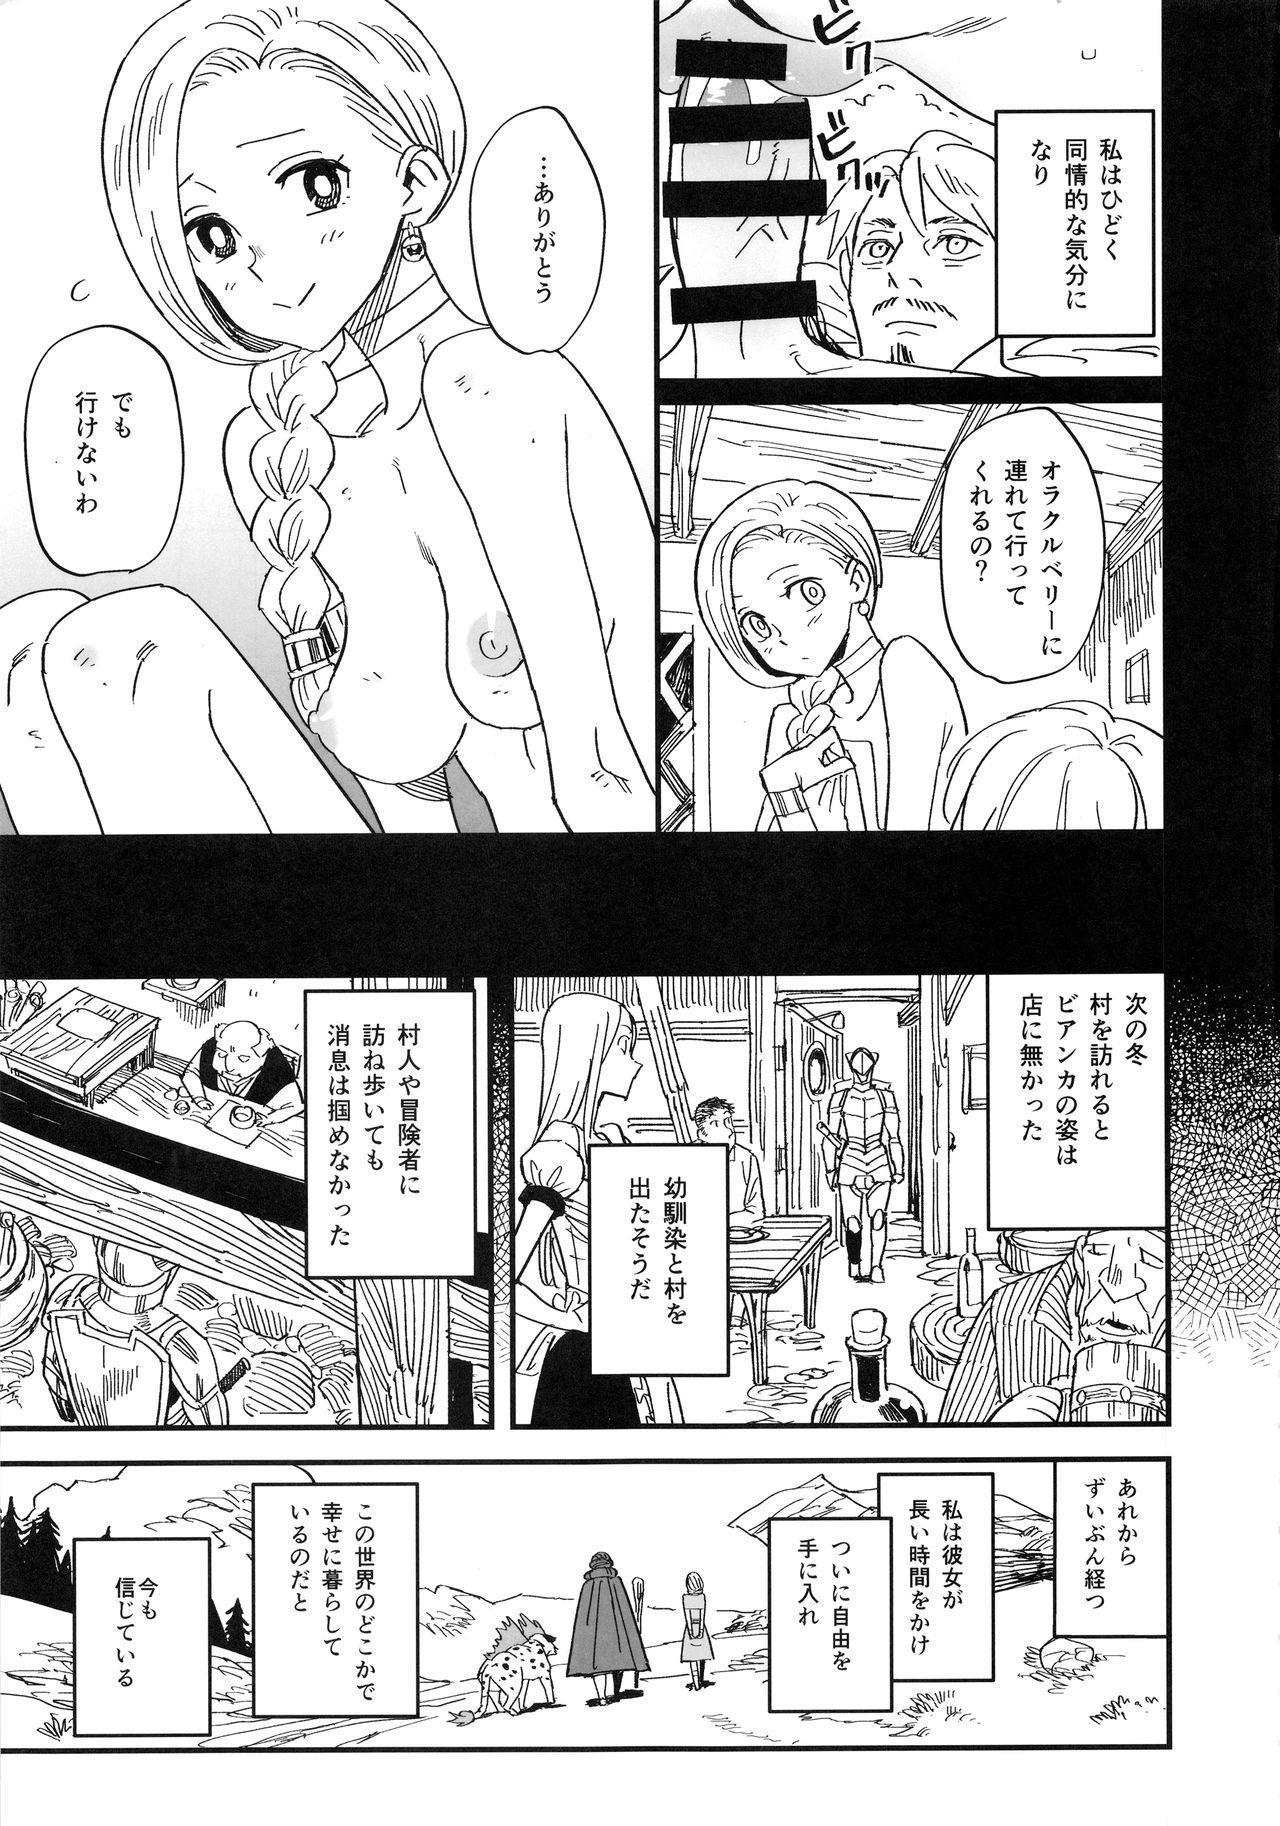 Mamono no Hanayome - Devil's Bride 7